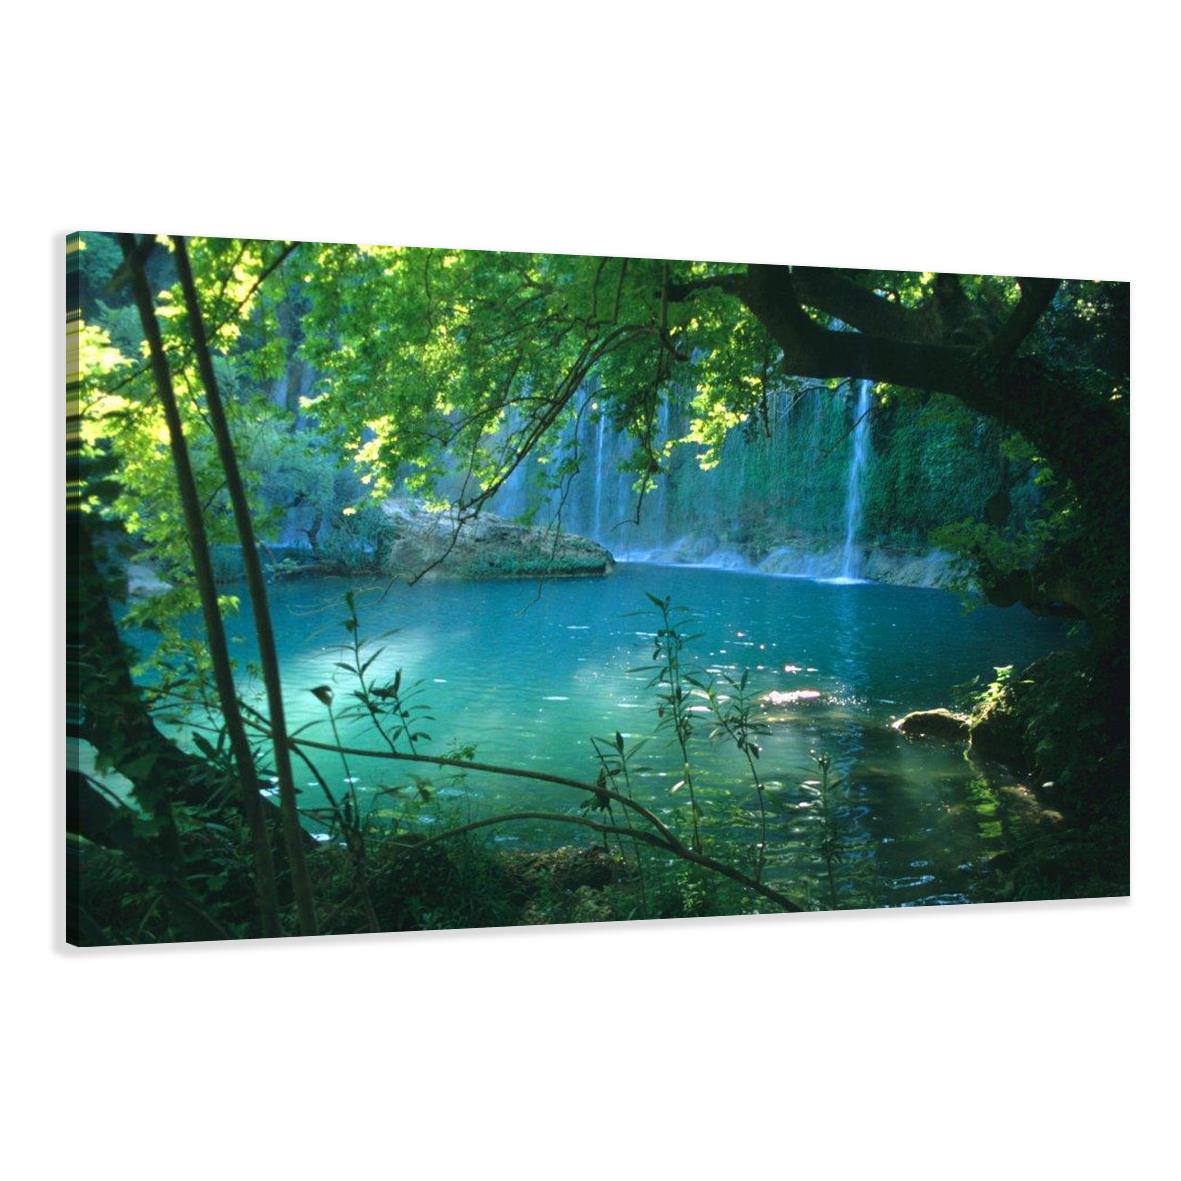 Bild wandbilder kunstdrucke bilder leinwandbilder for Bilder wandbilder